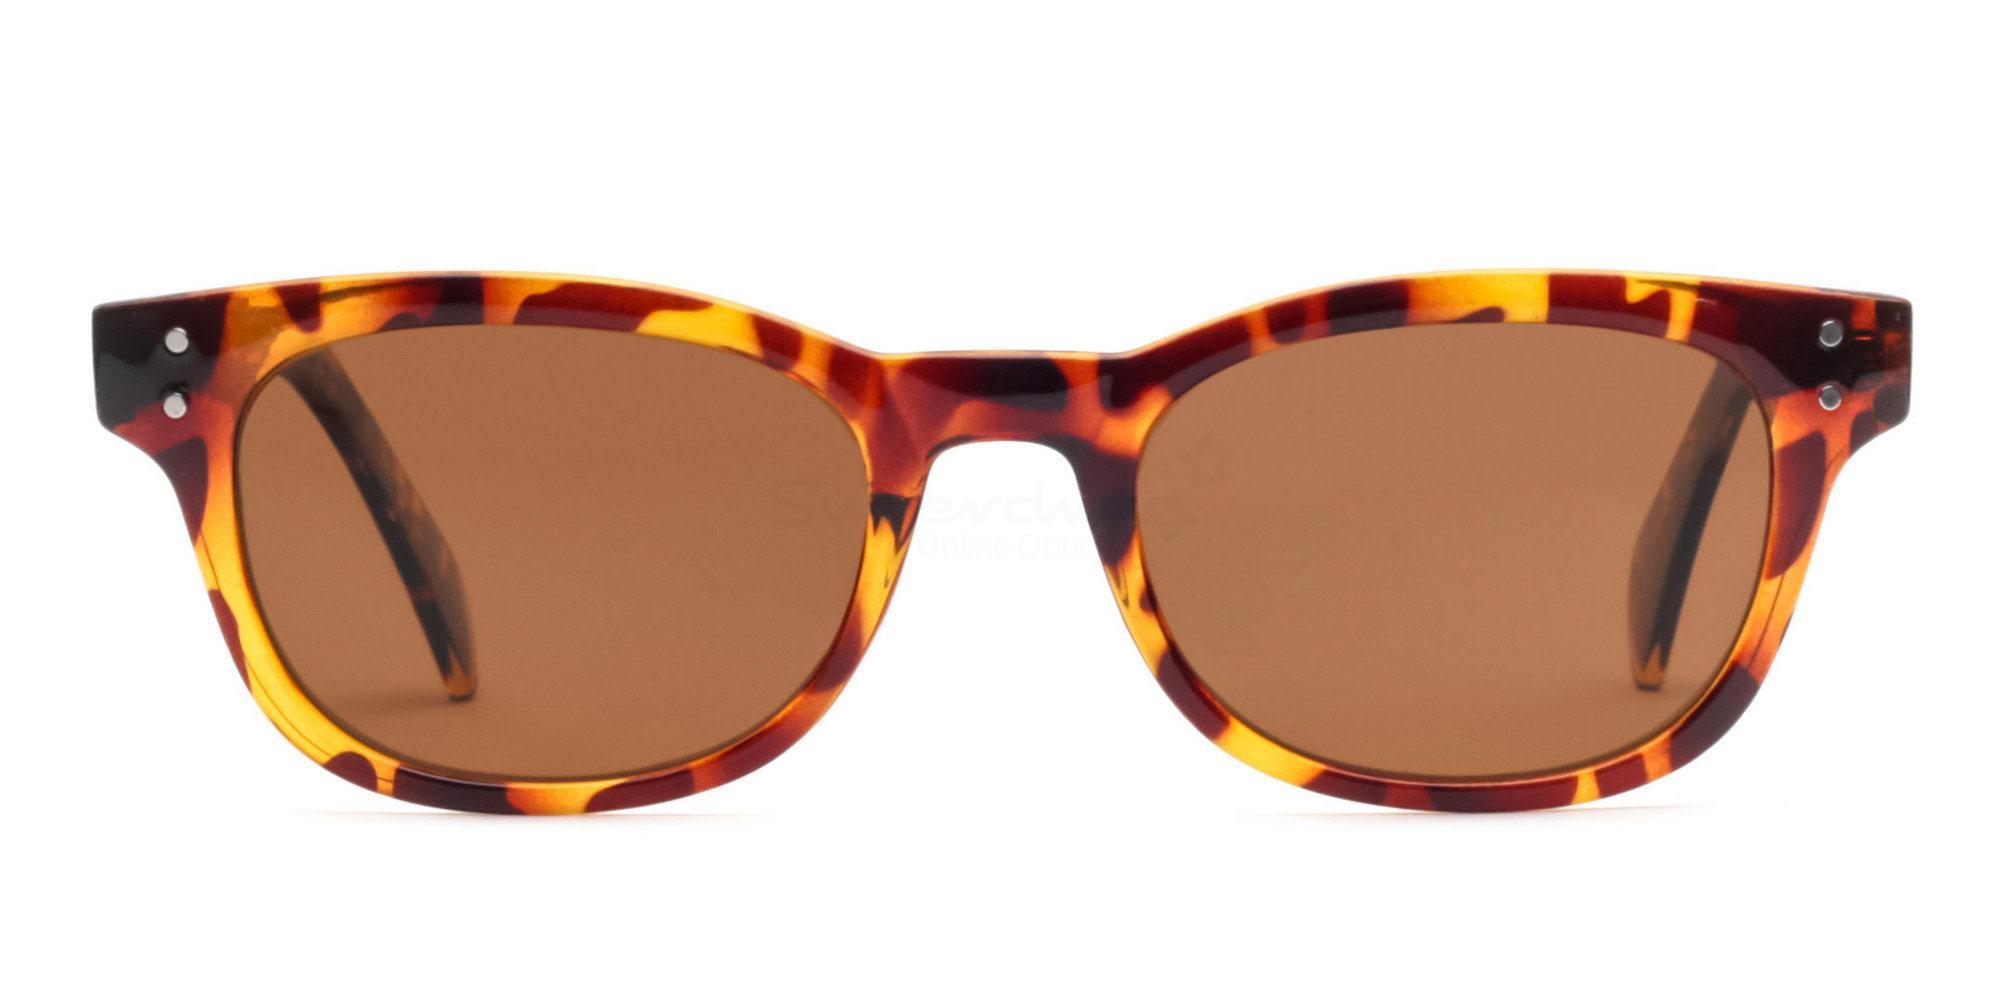 C01 Polarized Brown P2249 Havana (Polarized) Sunglasses, Neon